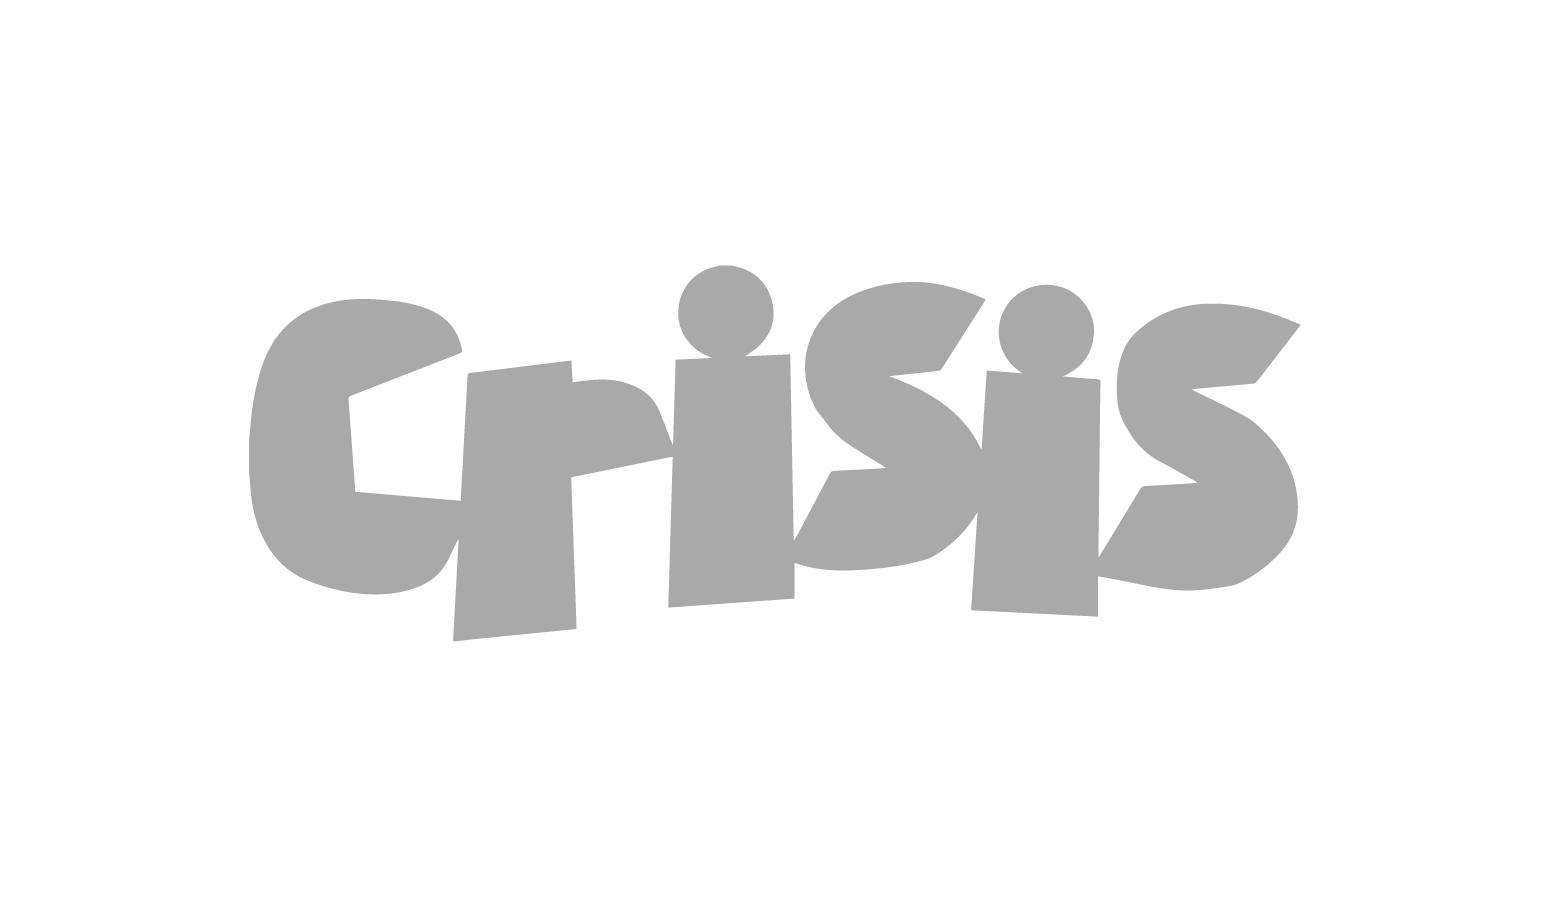 crisislogo-01.jpg